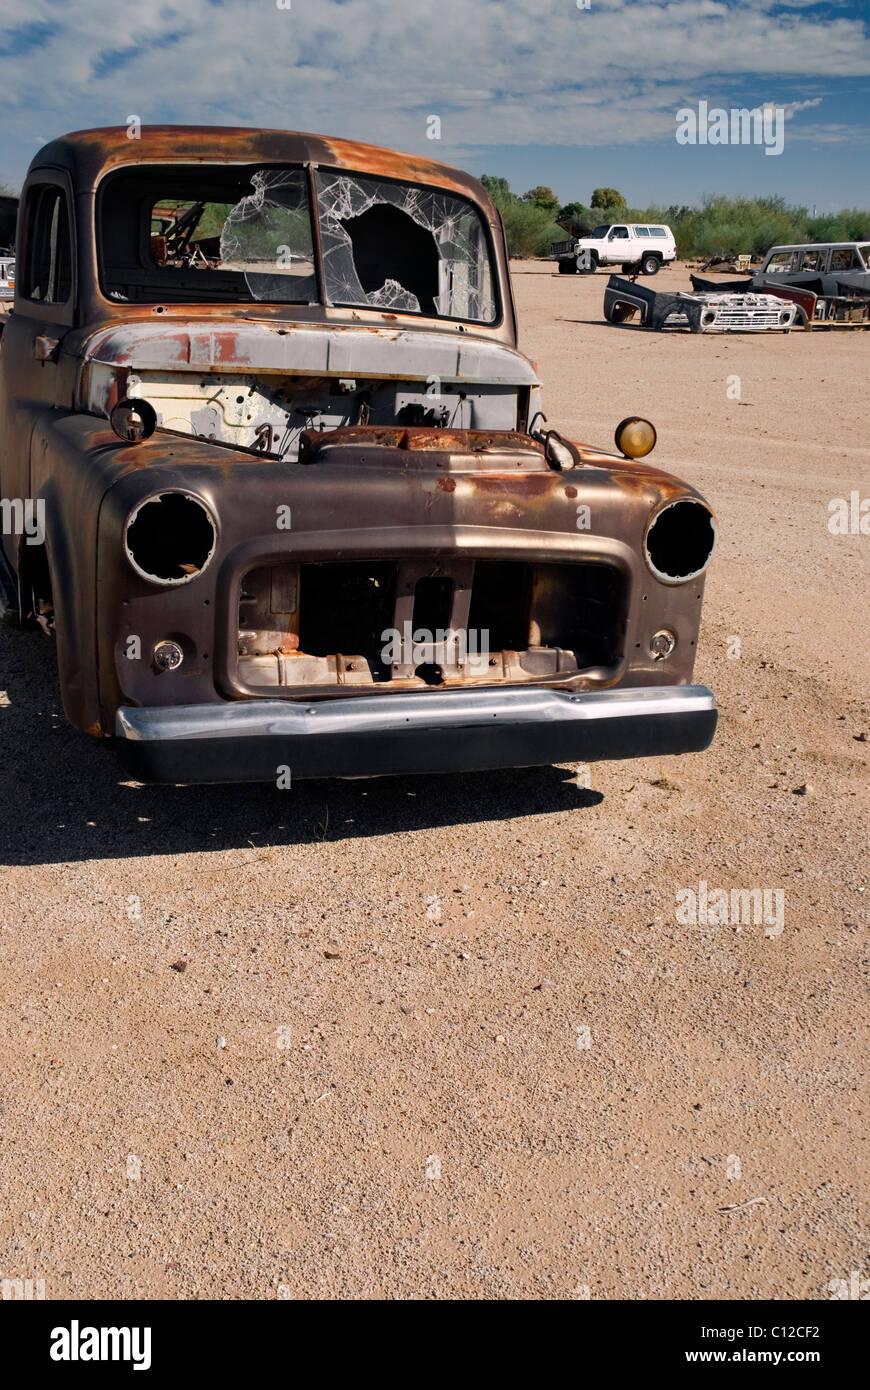 Junkyard Truck - Stock Image